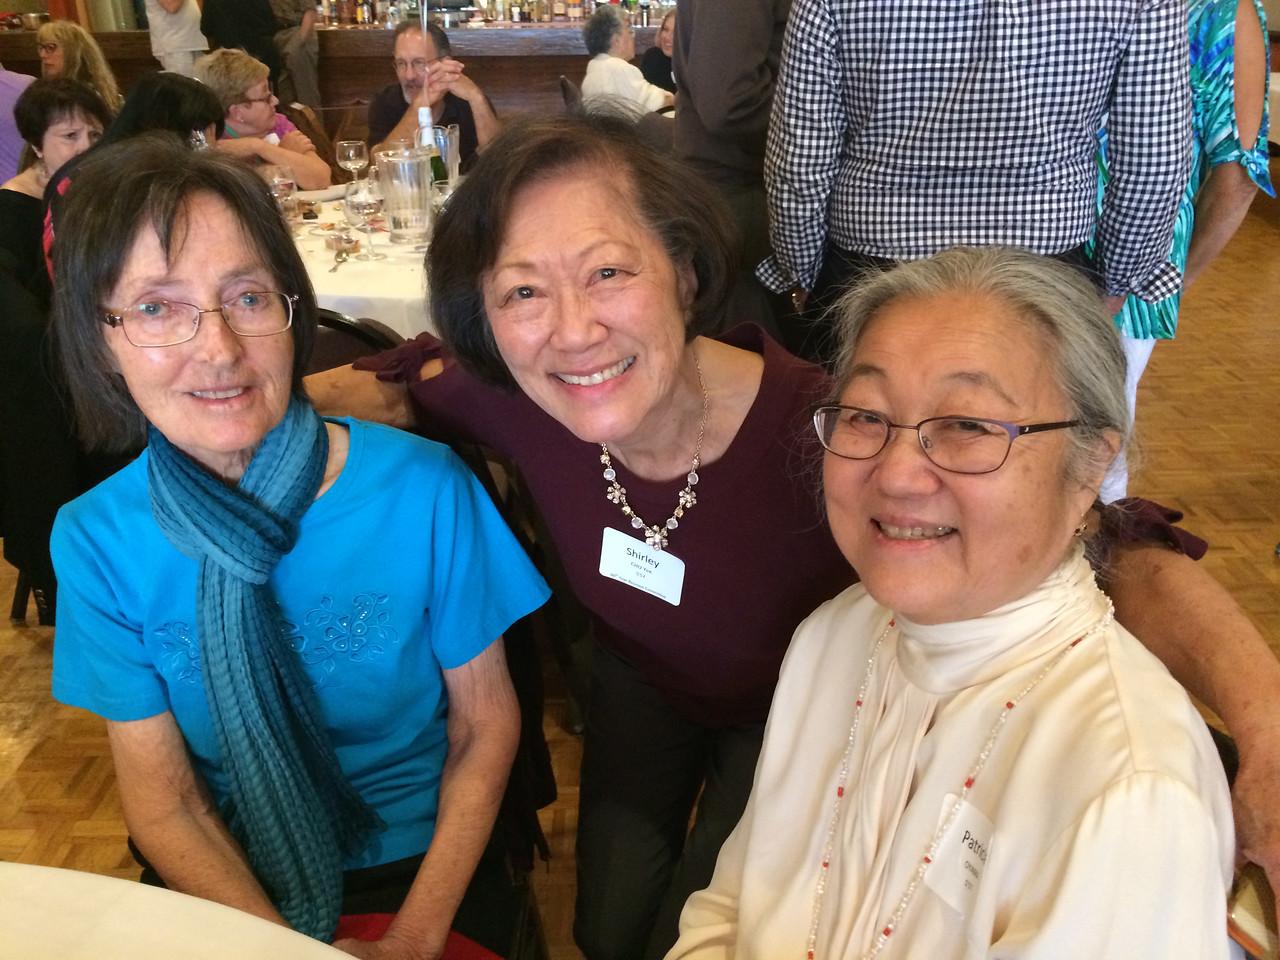 (l-r) Sandy (Potter) Lundgren - S'57, Shirley (Chu) Yee - S'57, Patricia Oyama - S'57